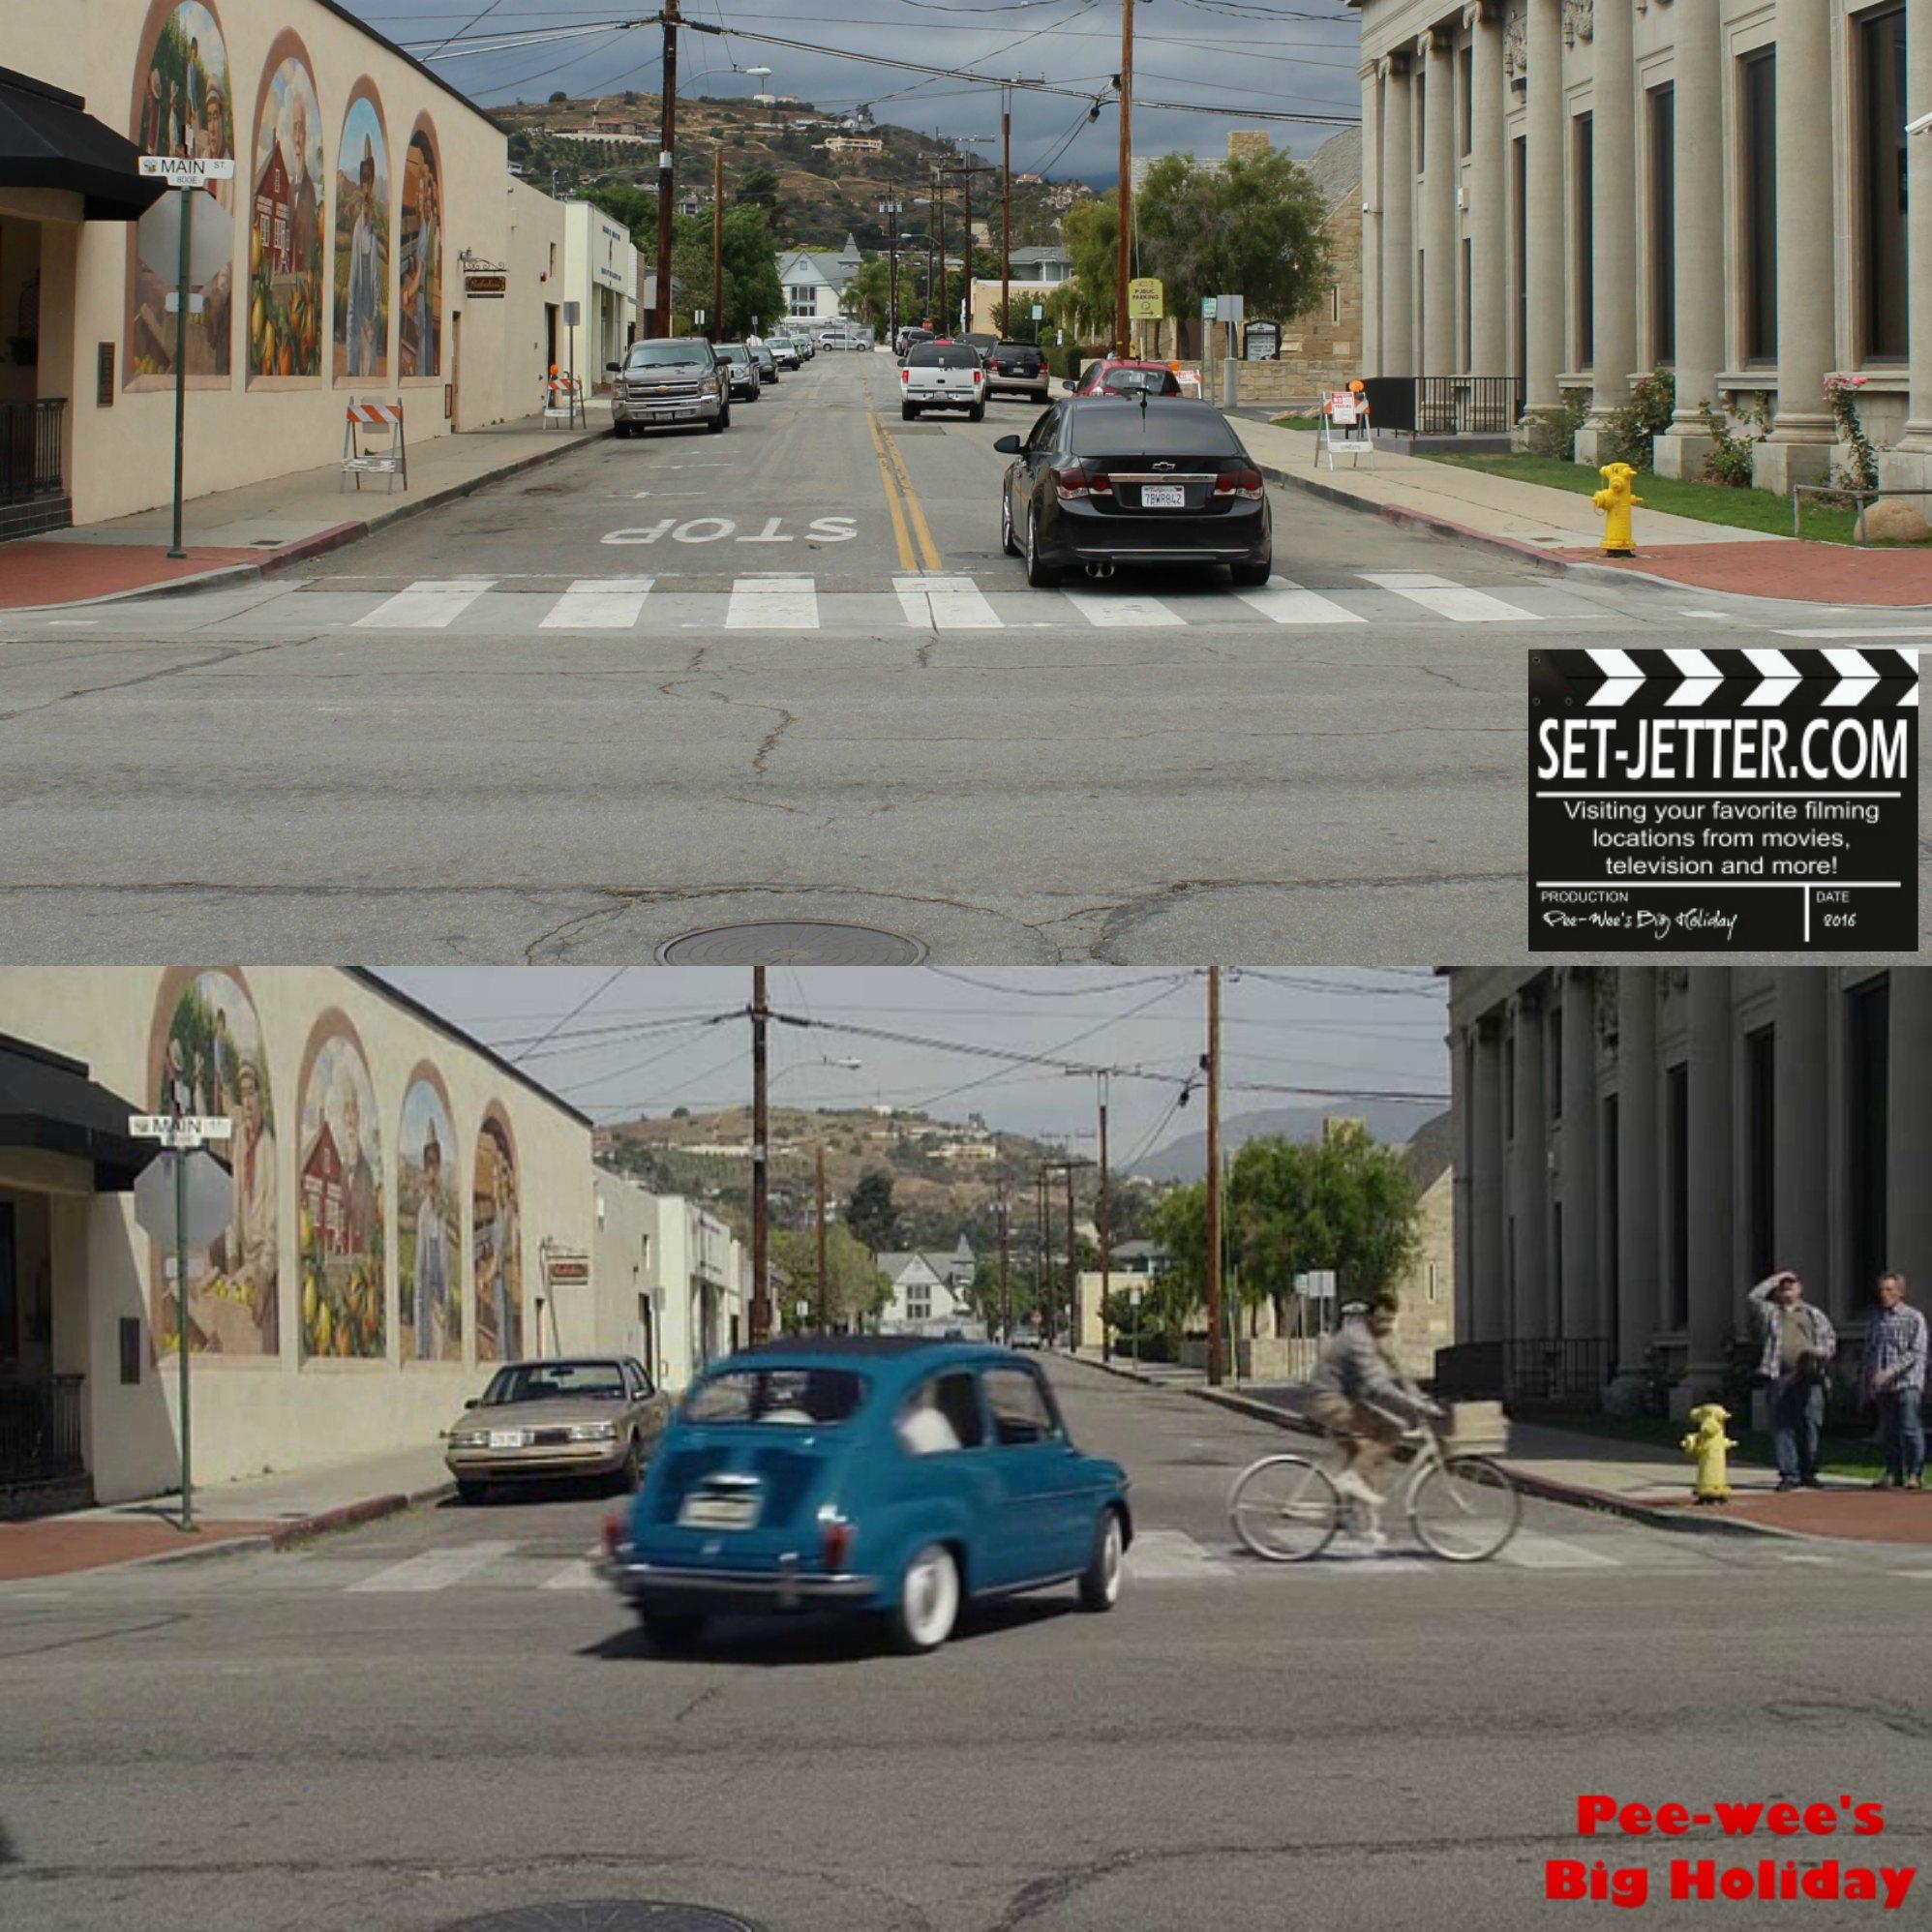 Pee Wee's Big Holiday comparison 350.jpg